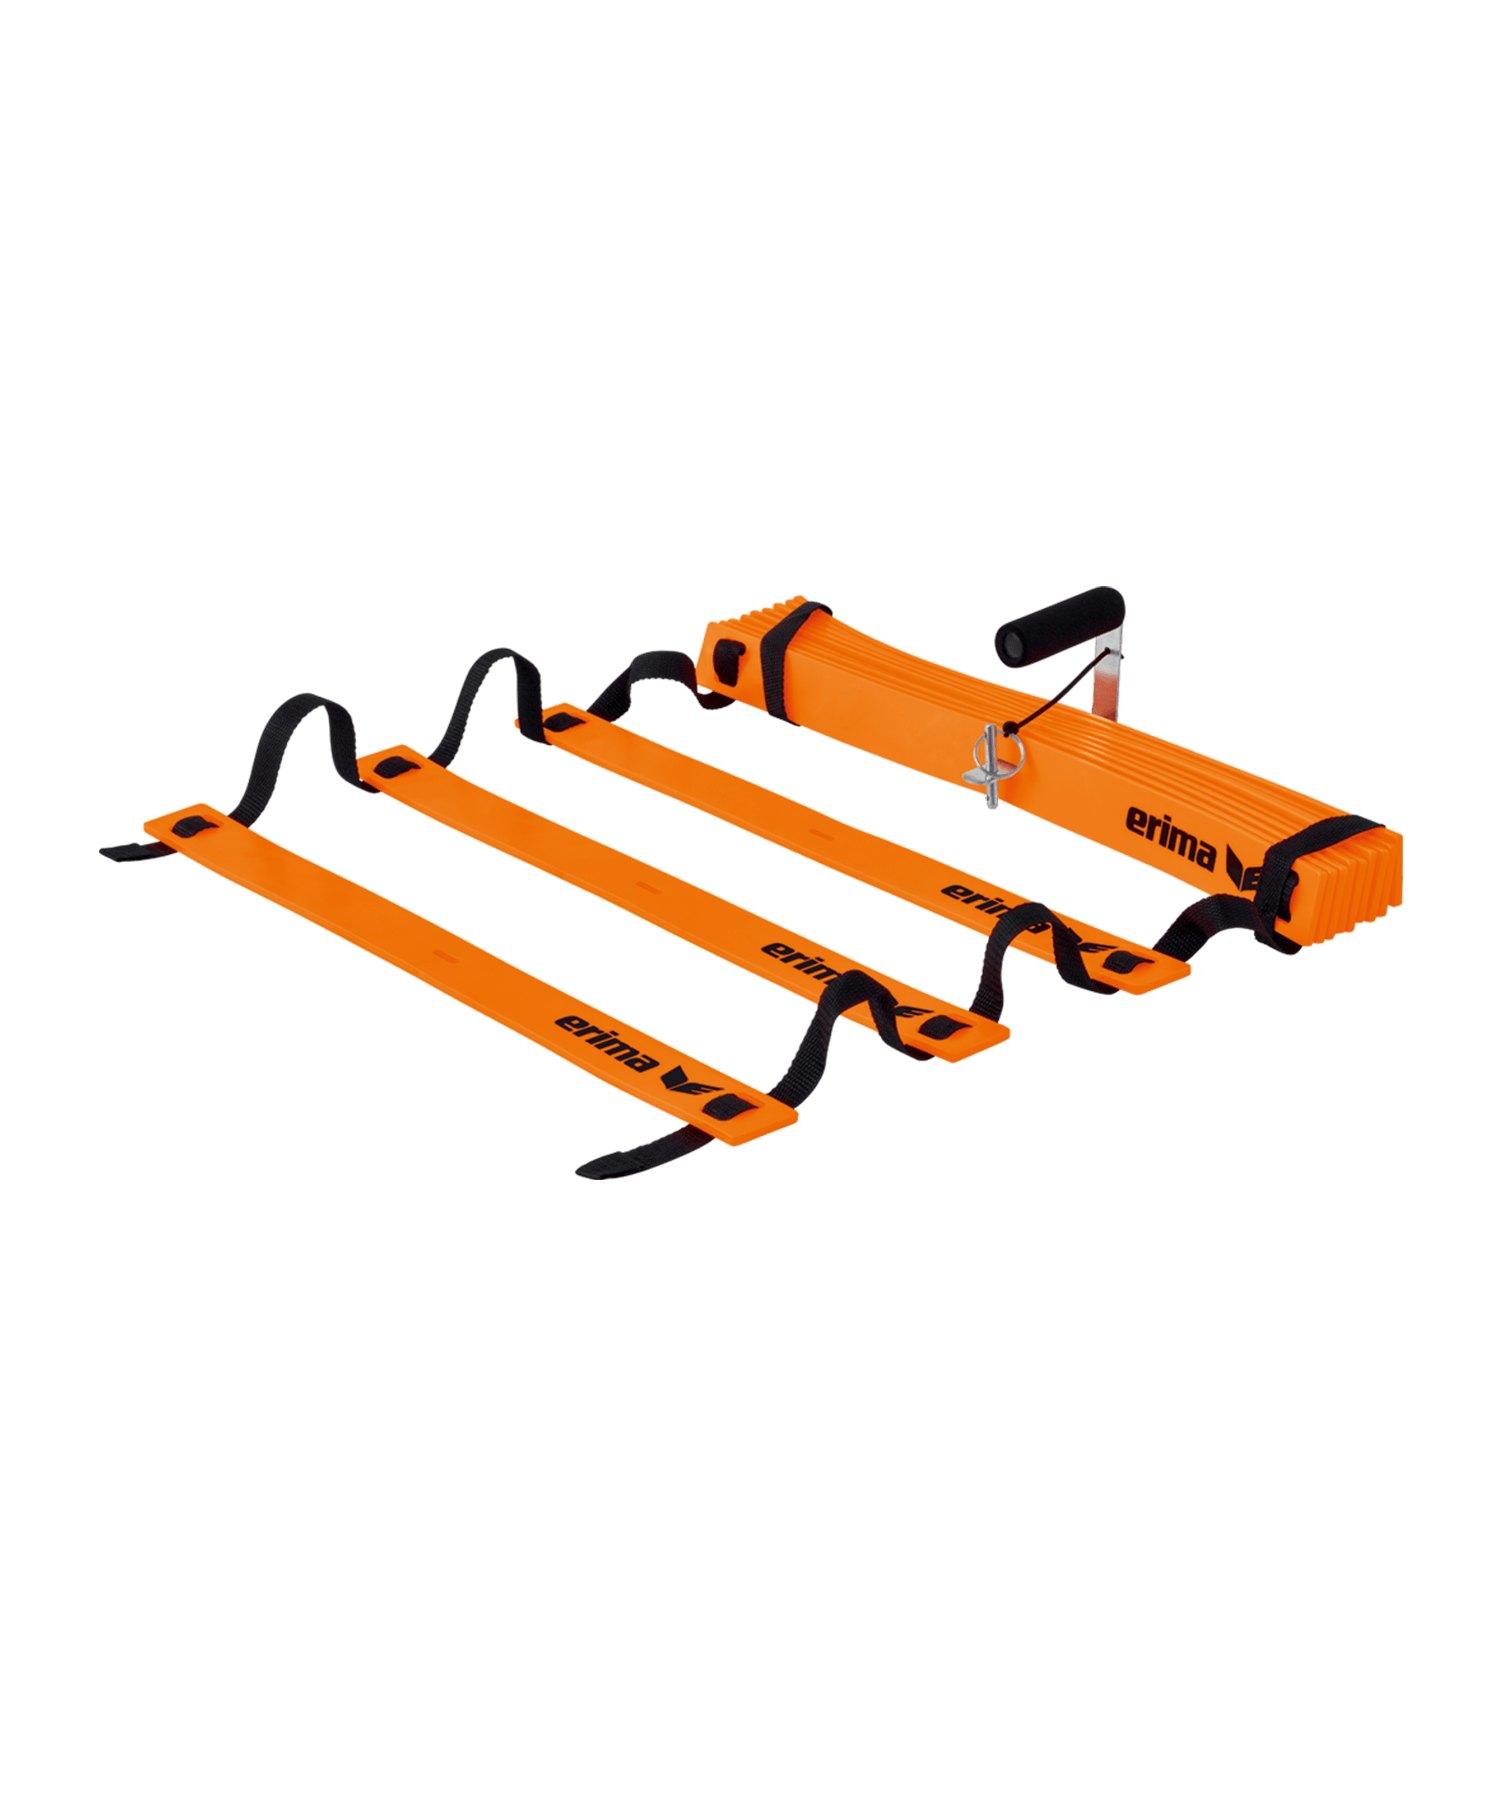 Erima Koordinationsleiter Orange - orange